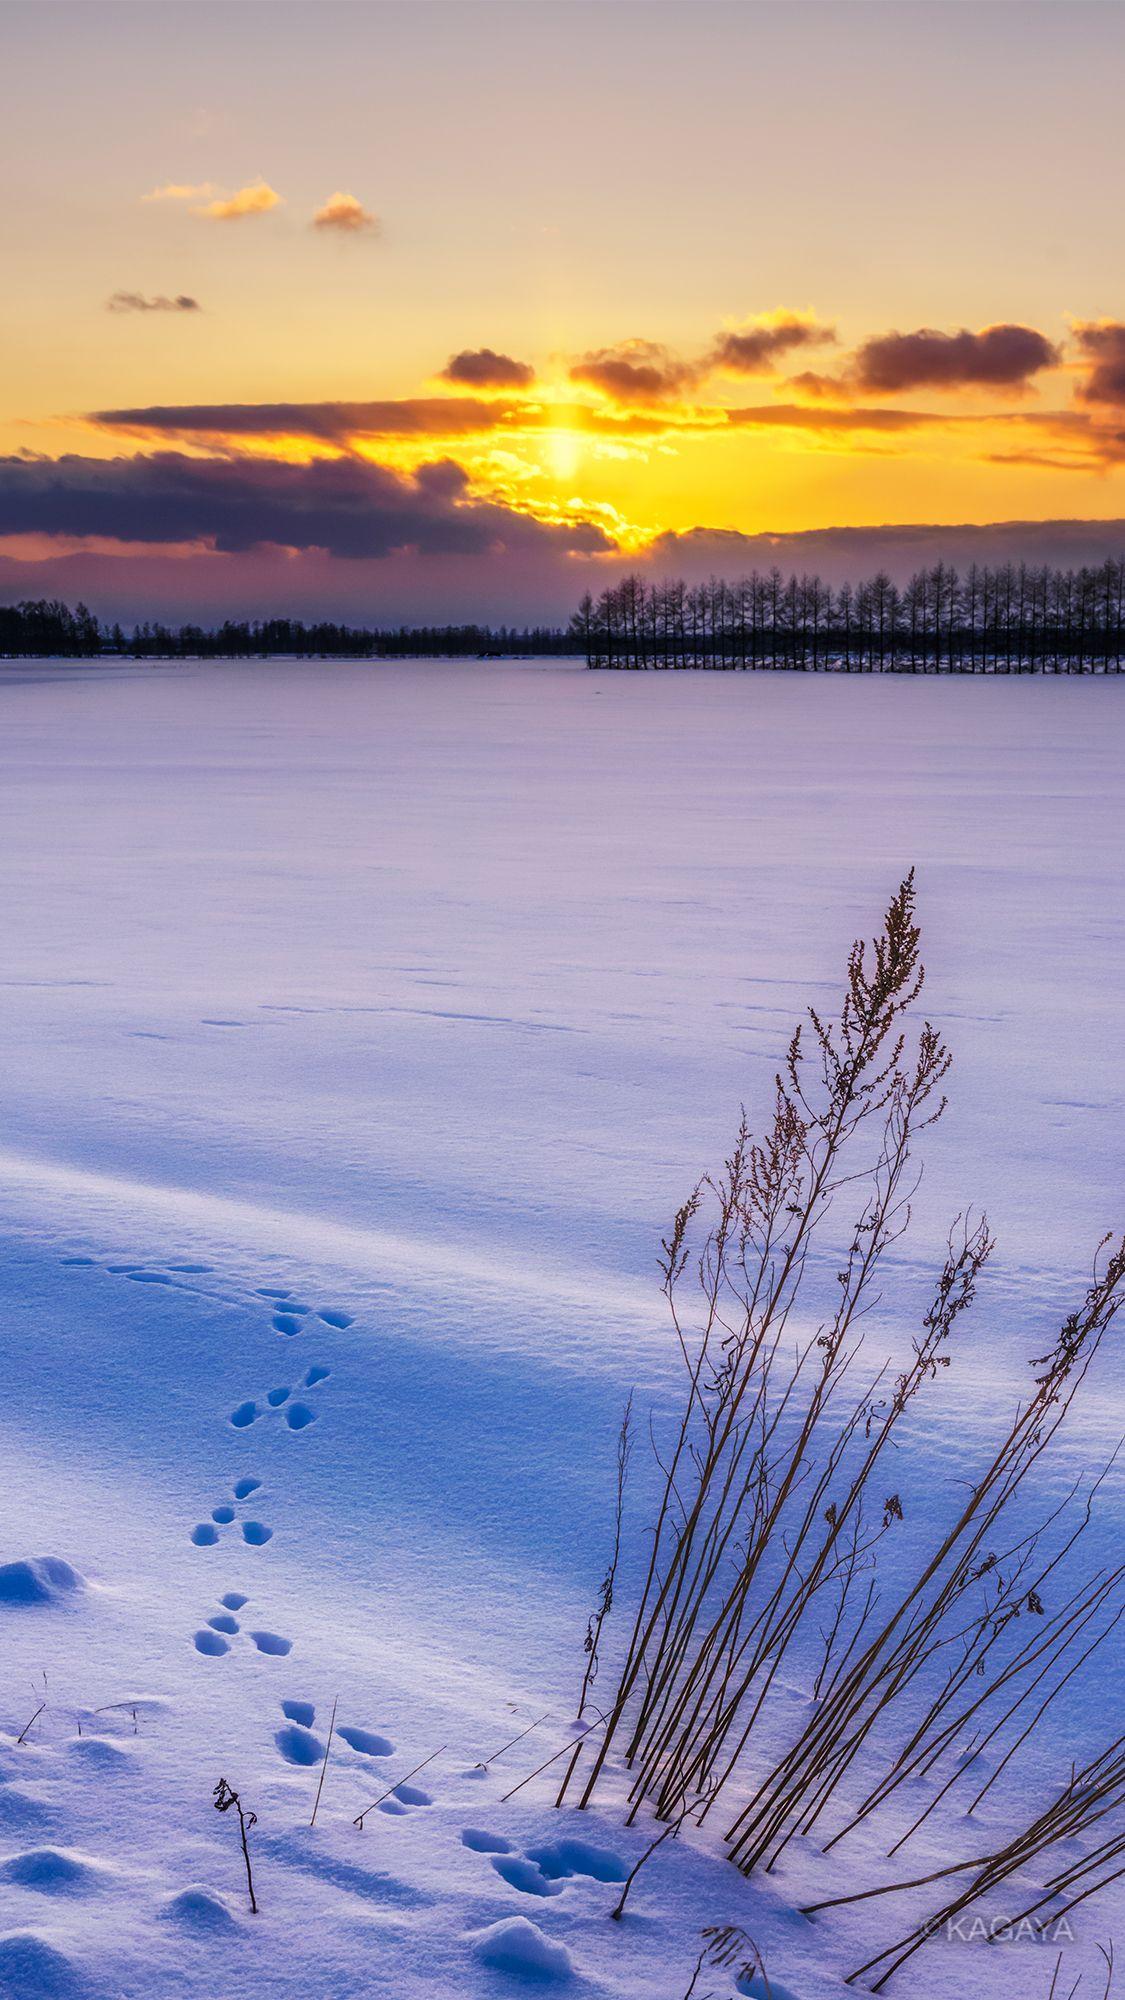 Kagaya On 冬の壁紙 綺麗な風景 壁紙